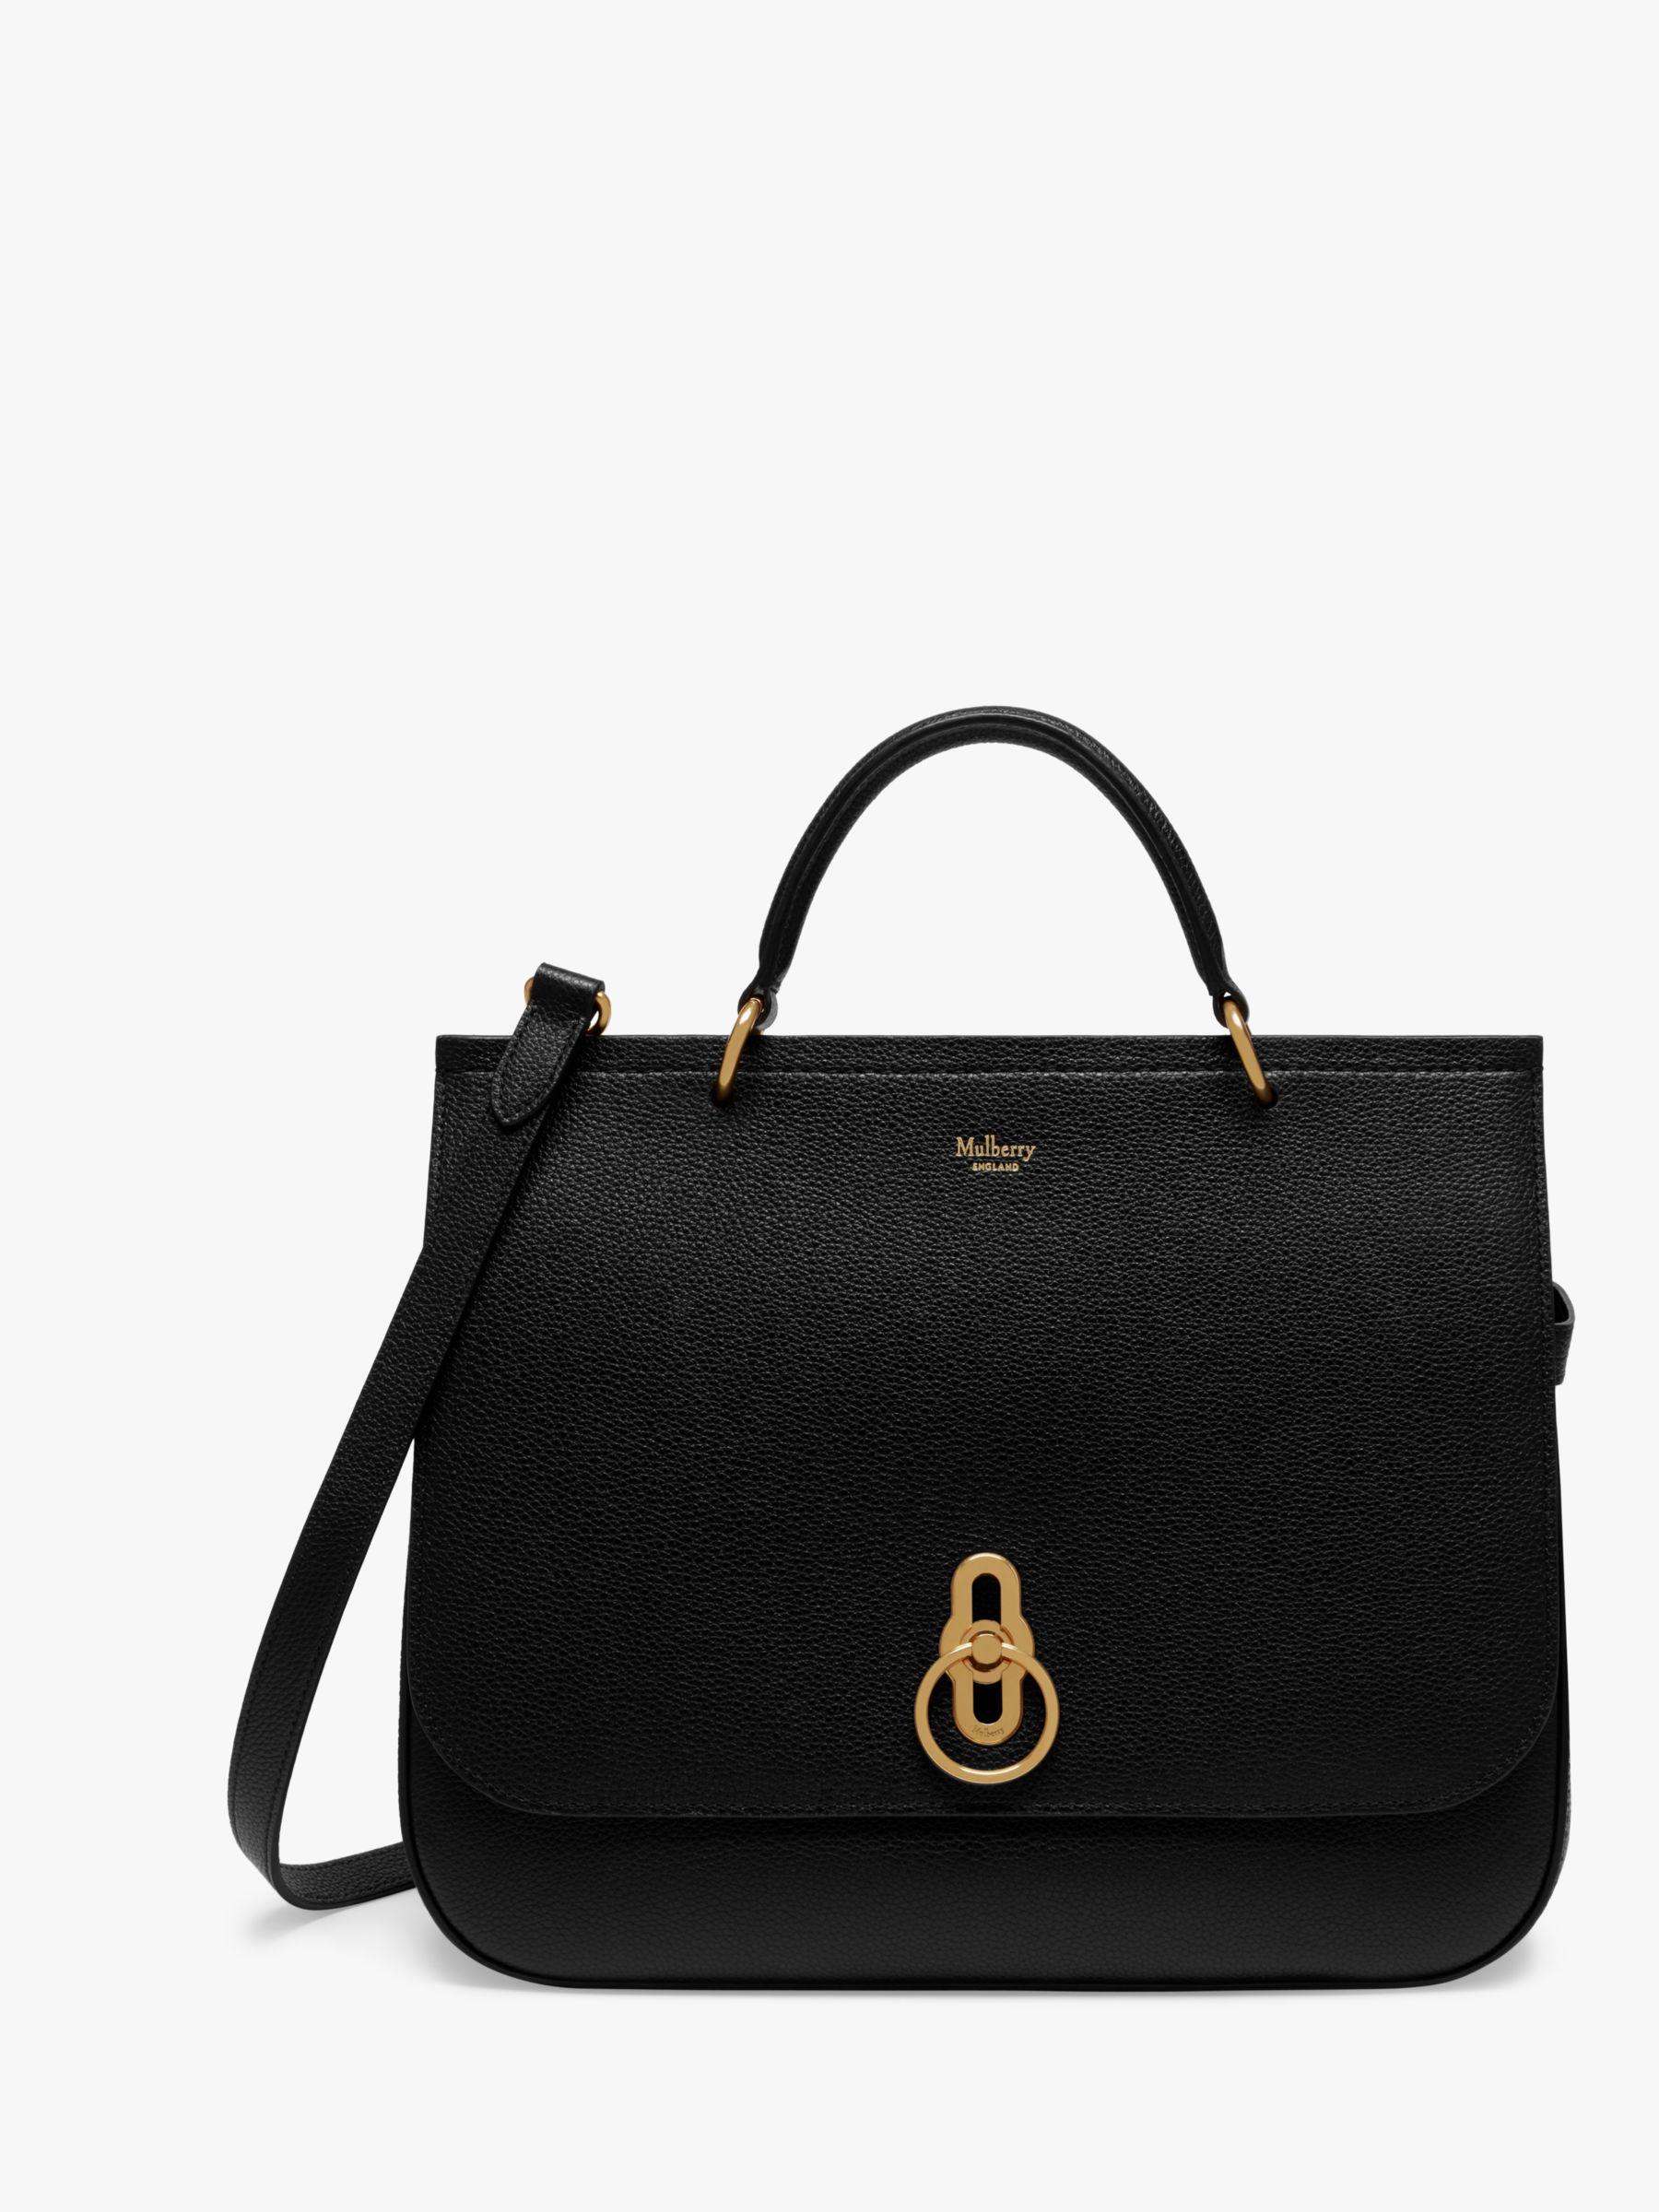 c2214afa73 Mulberry Amberley Small Classic Grain Leather Satchel Bag, Black at John  Lewis & Partners